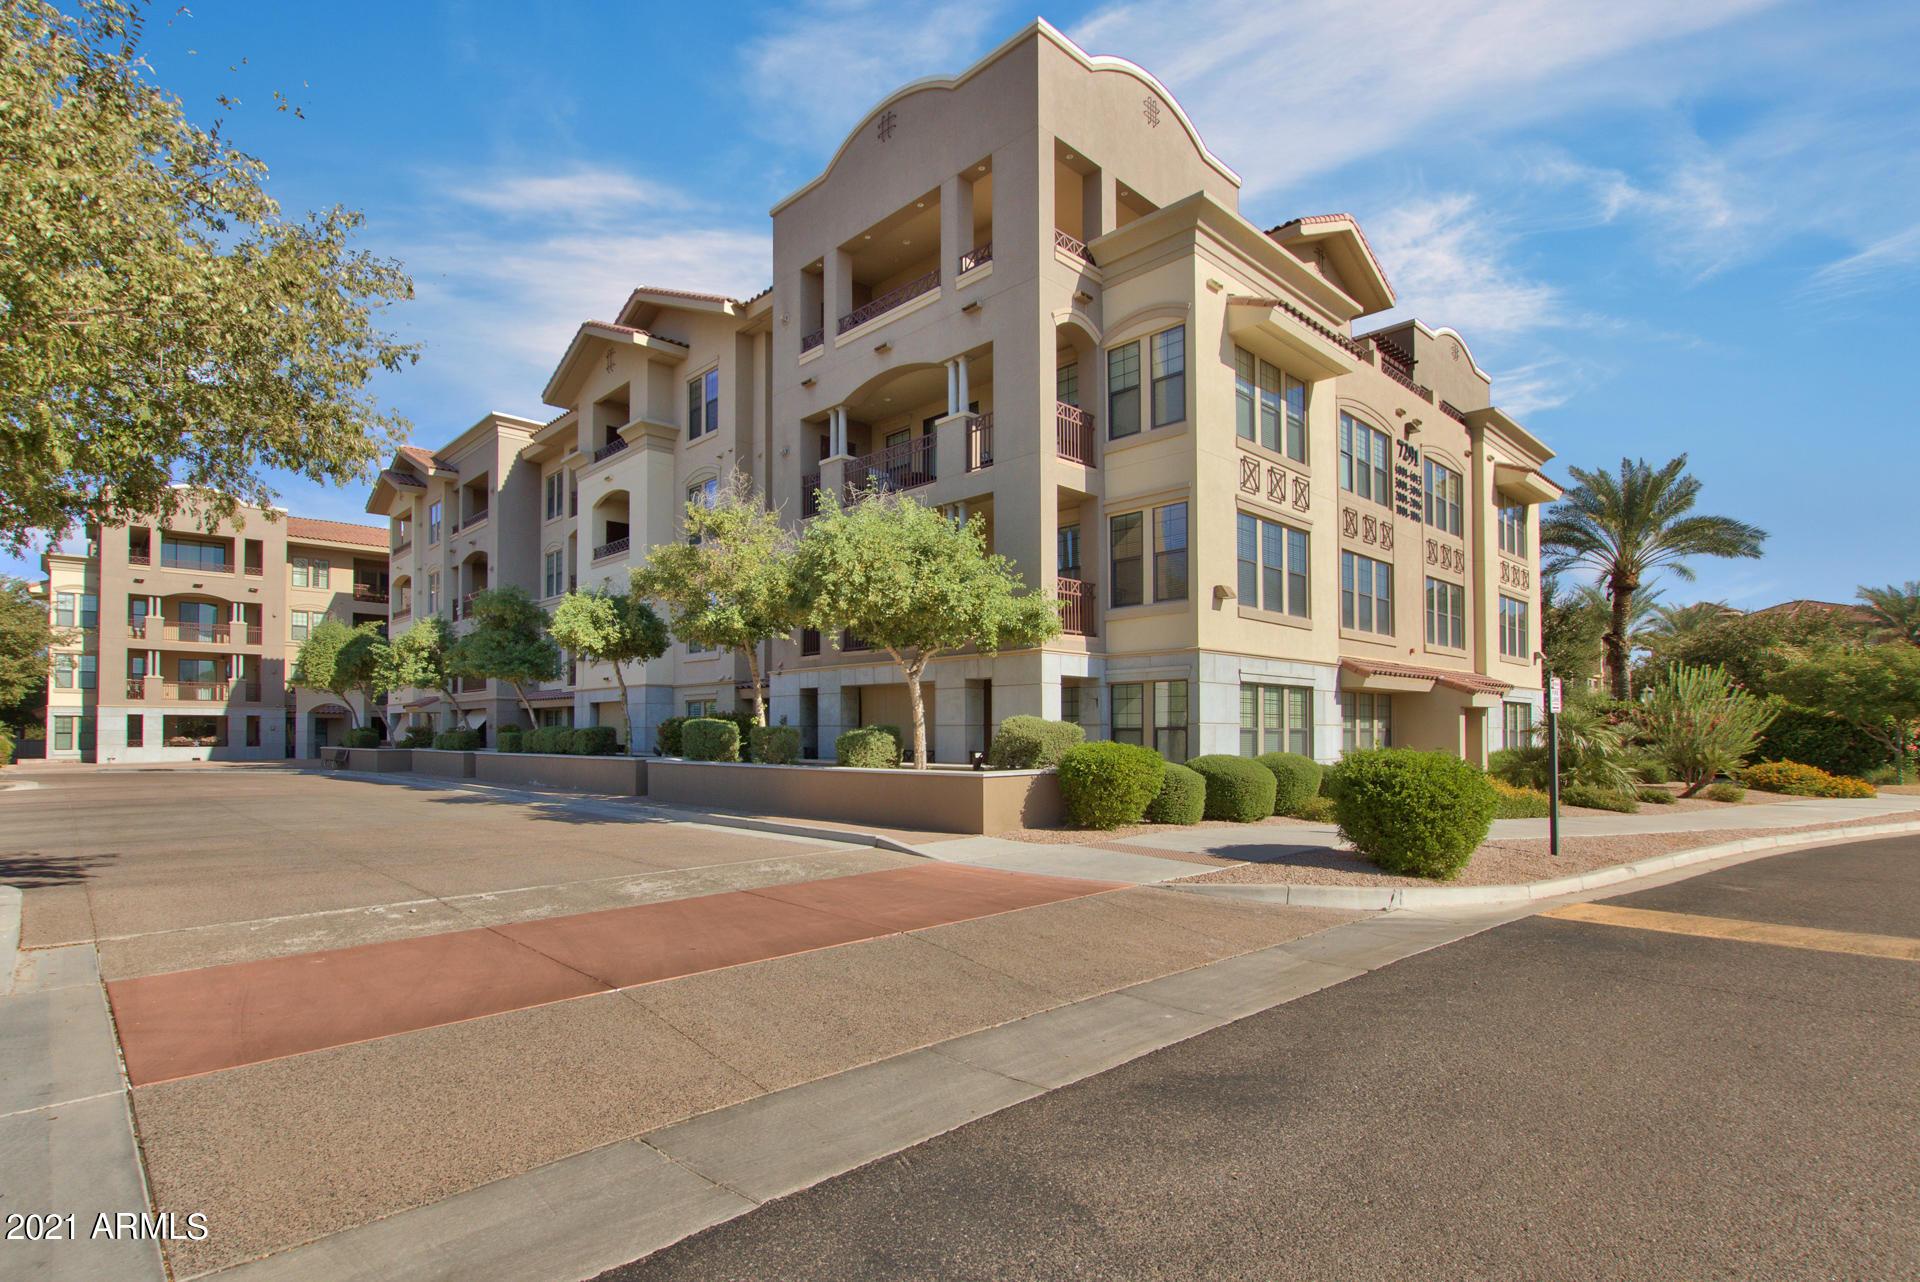 7291 N SCOTTSDALE Road # 2001, Paradise Valley, AZ 85253, 2 Bedrooms Bedrooms, ,Residential Lease,For Rent,7291 N SCOTTSDALE Road # 2001,6248196